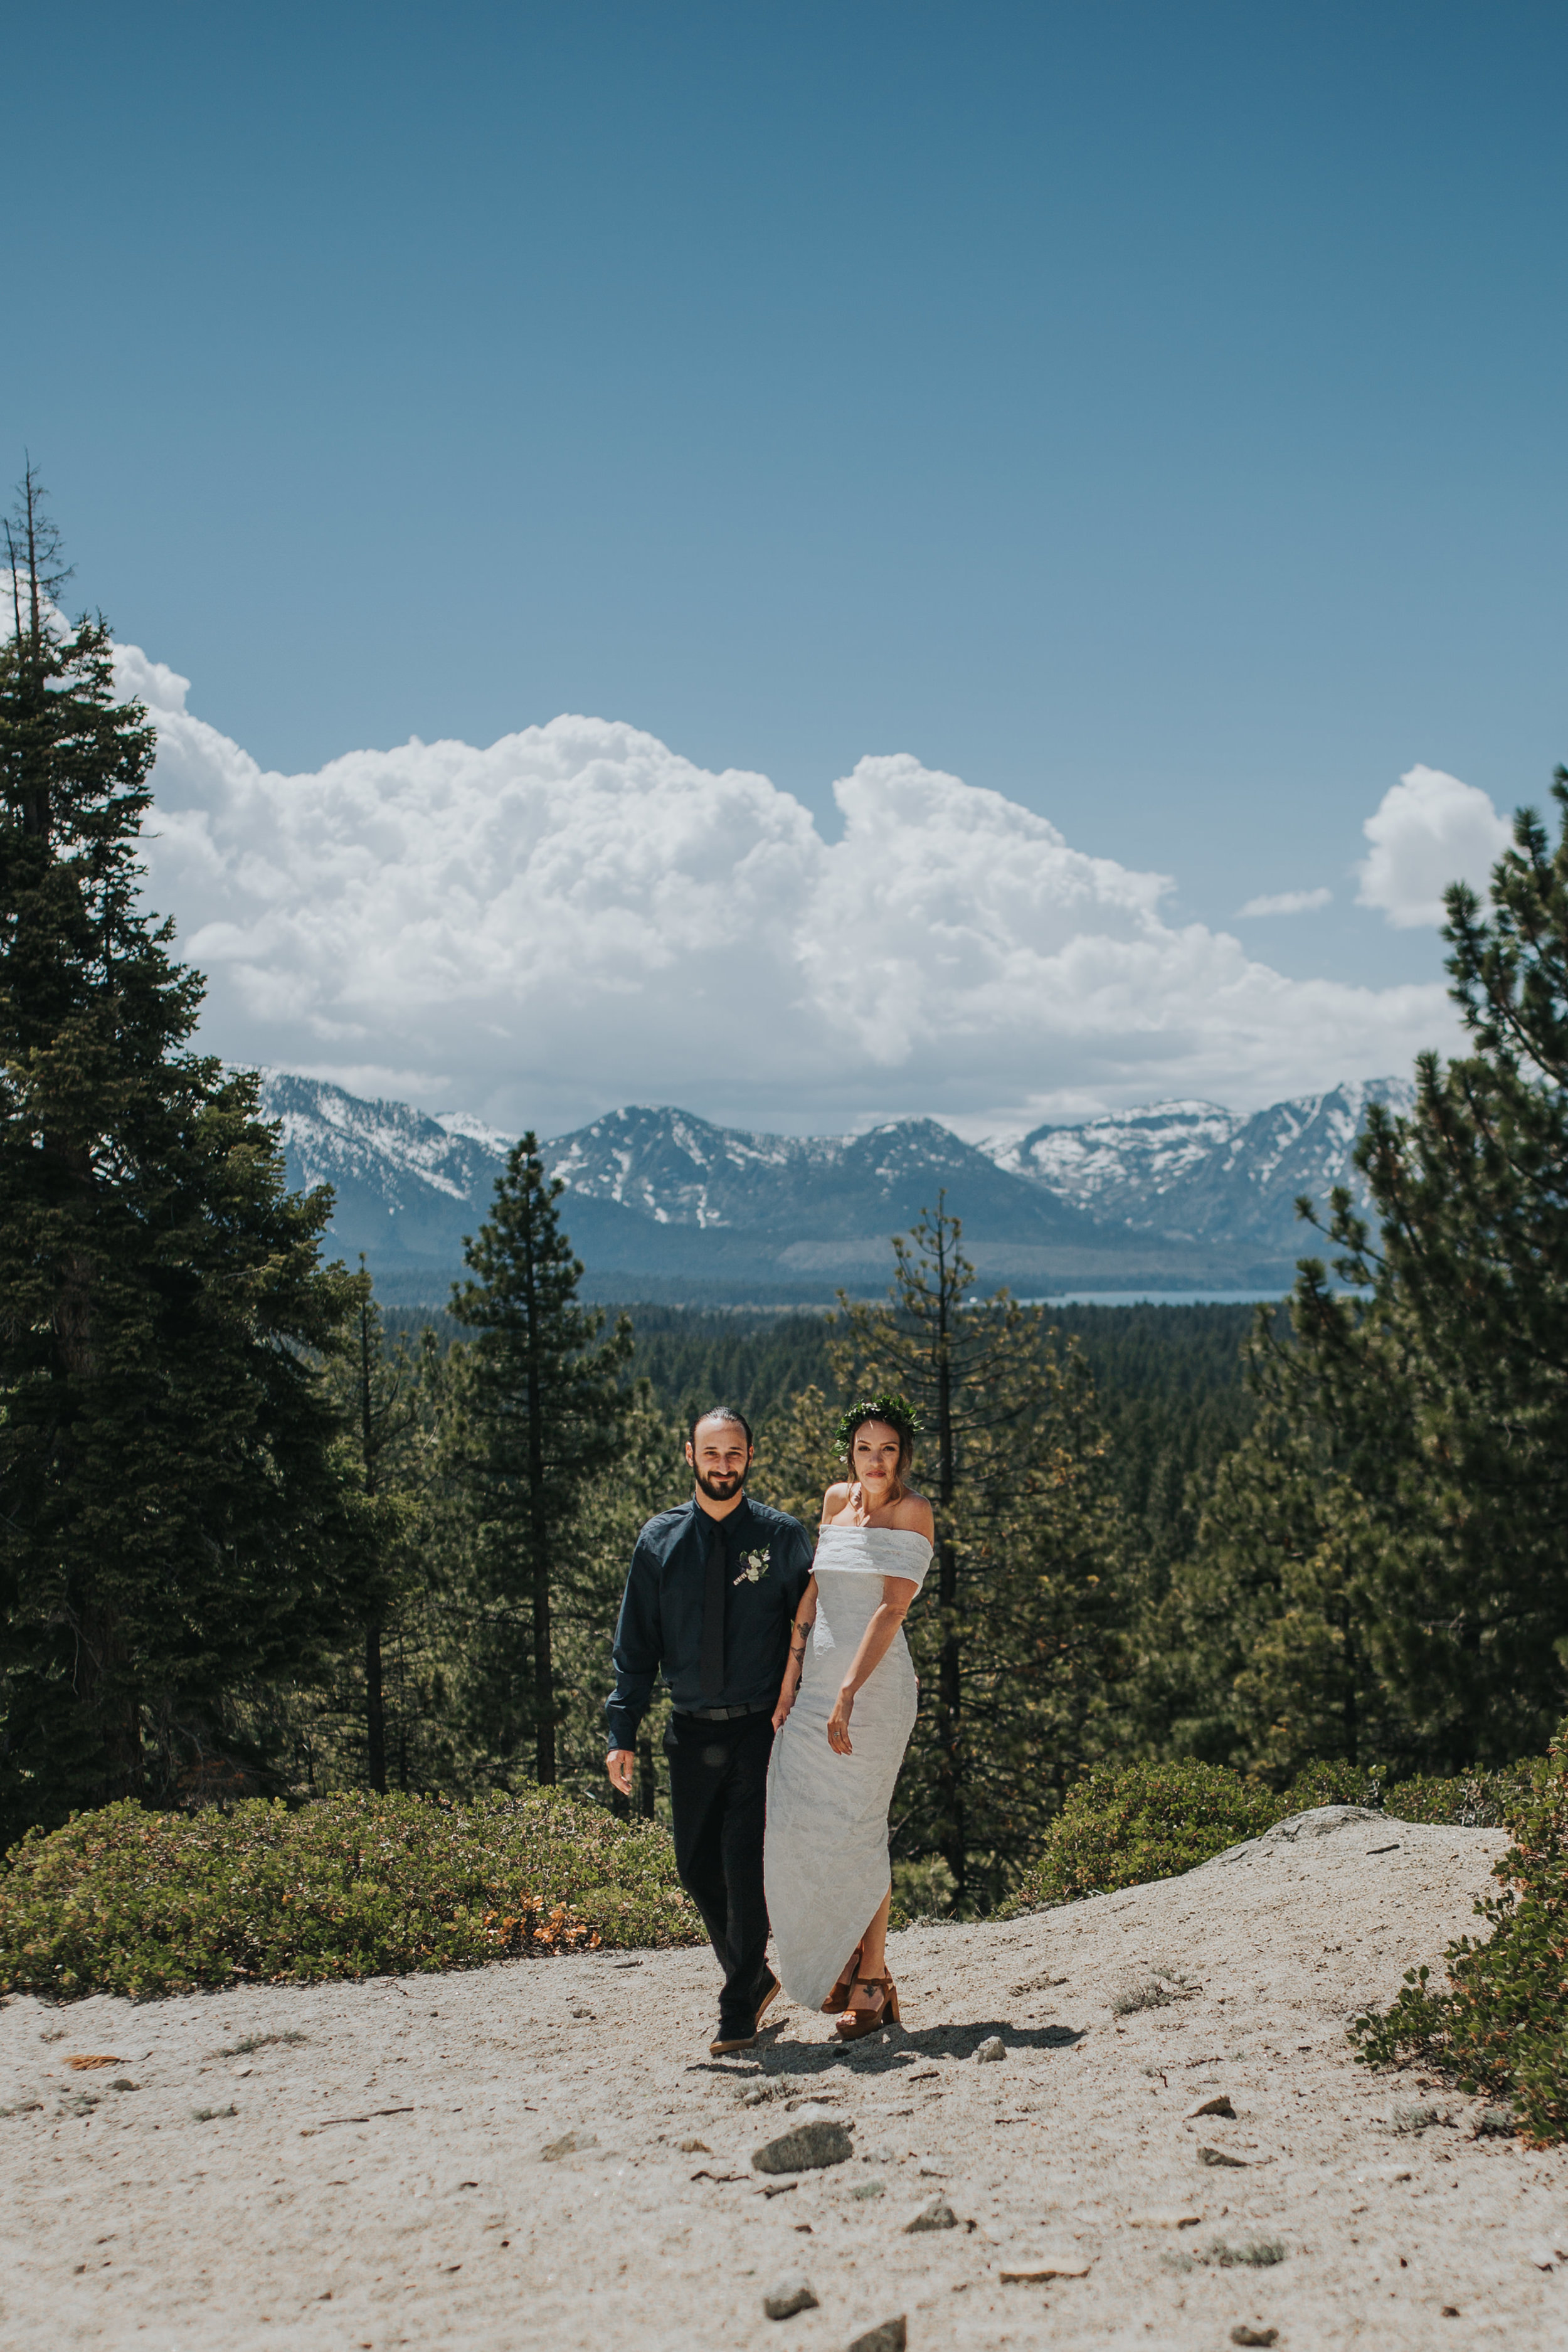 south-lake-tahoe-elopement-valerie-lendvay-photo-019.jpg